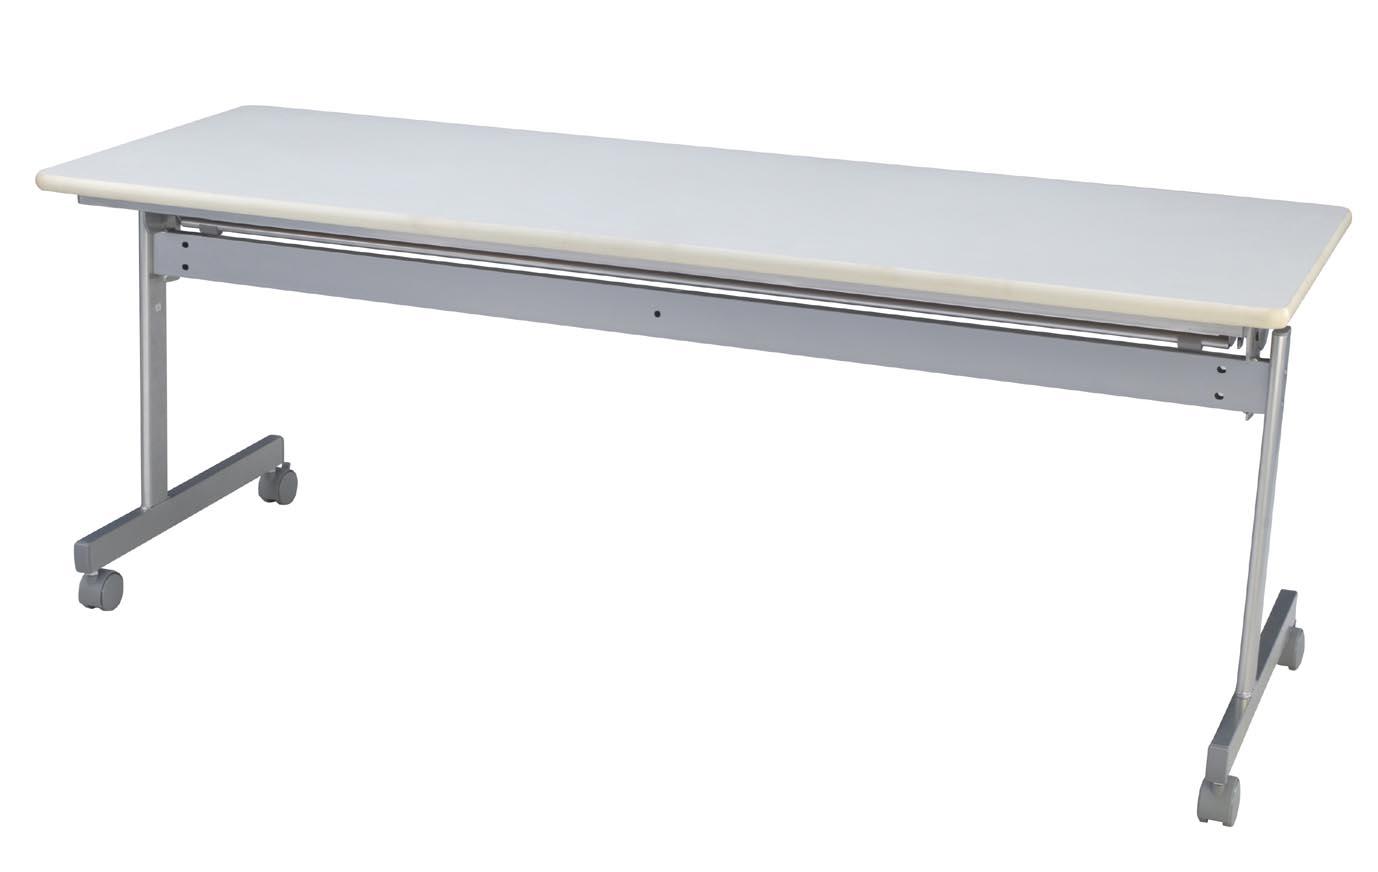 HITECHWOOD【ハイテクウッド】 会議用テーブル(跳ね上げ式) 幕板なし ITO-KS1860NW W1800xD600xH700